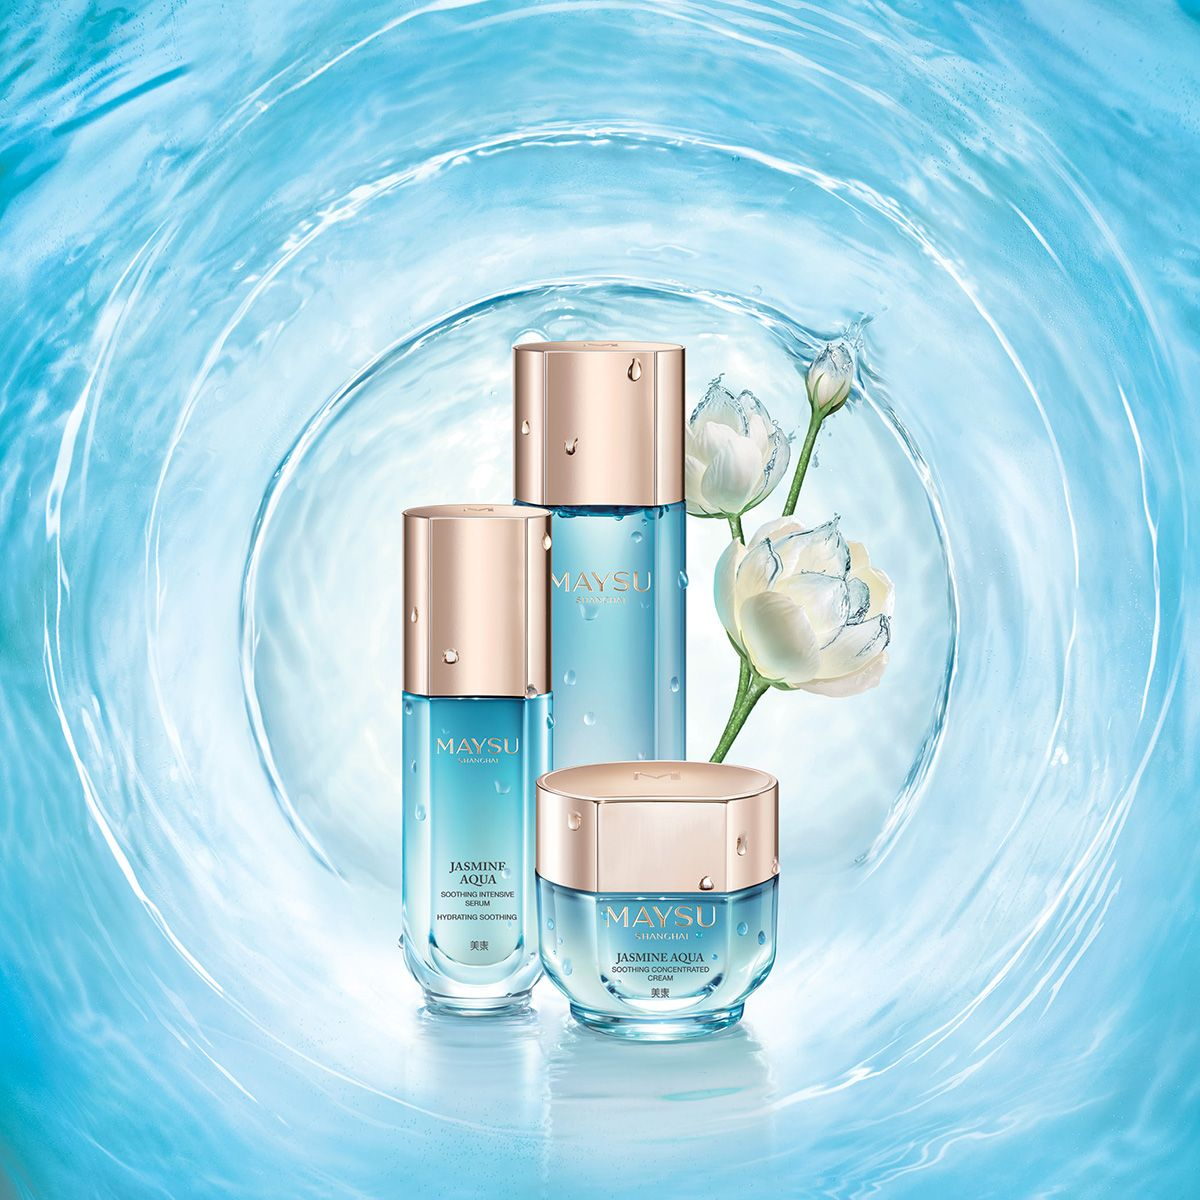 Maysu Cosmetics on Behance Cosmetic packaging design